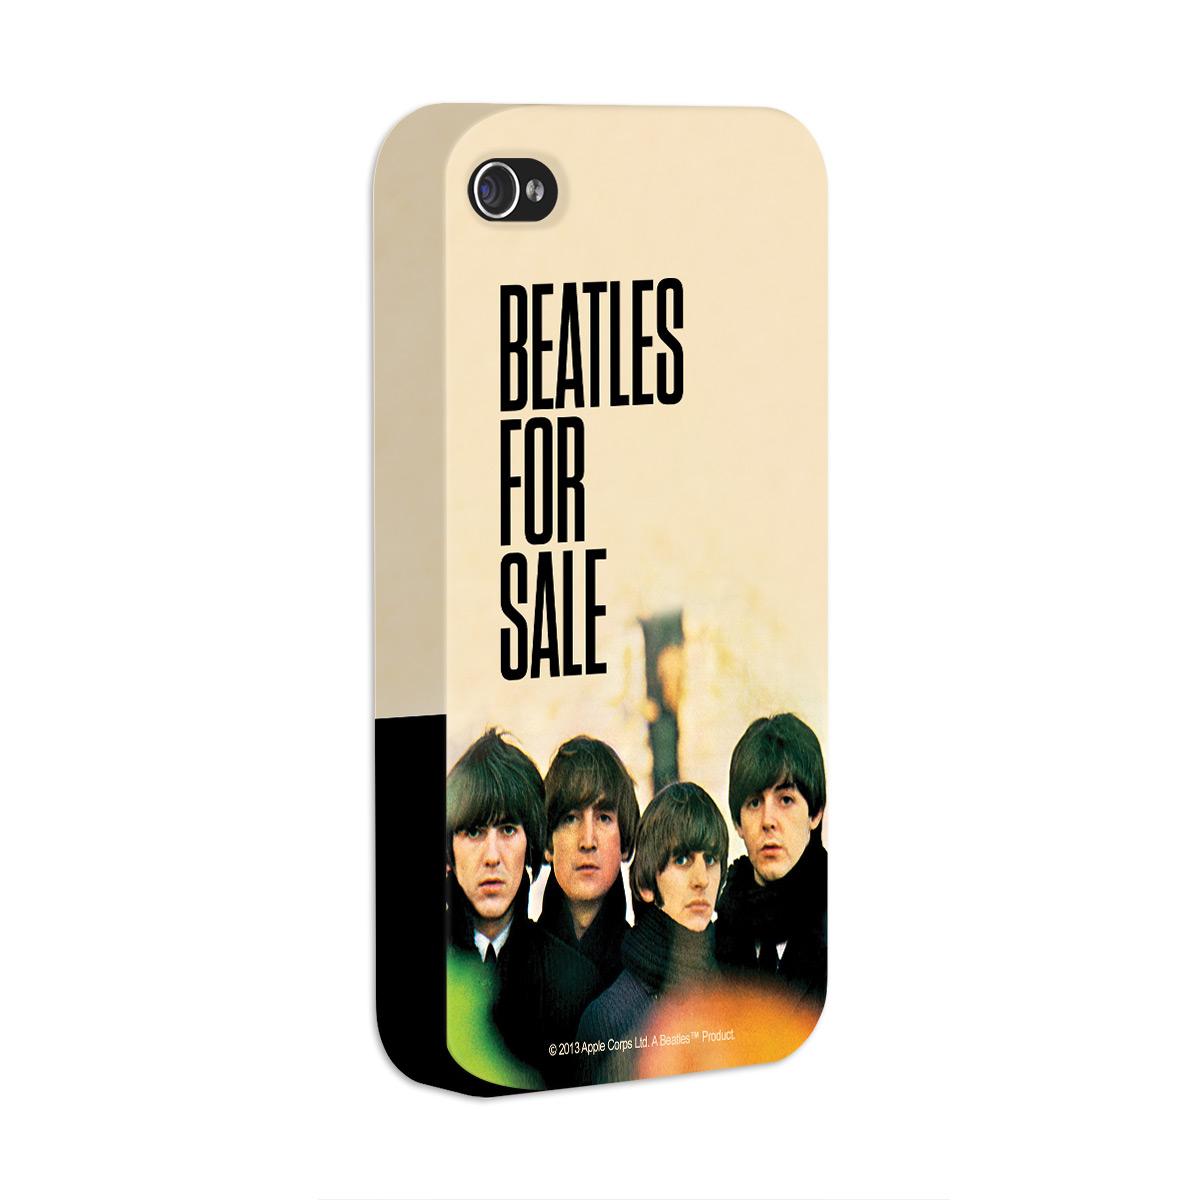 Capa de iPhone 4/4S The Beatles For Sale